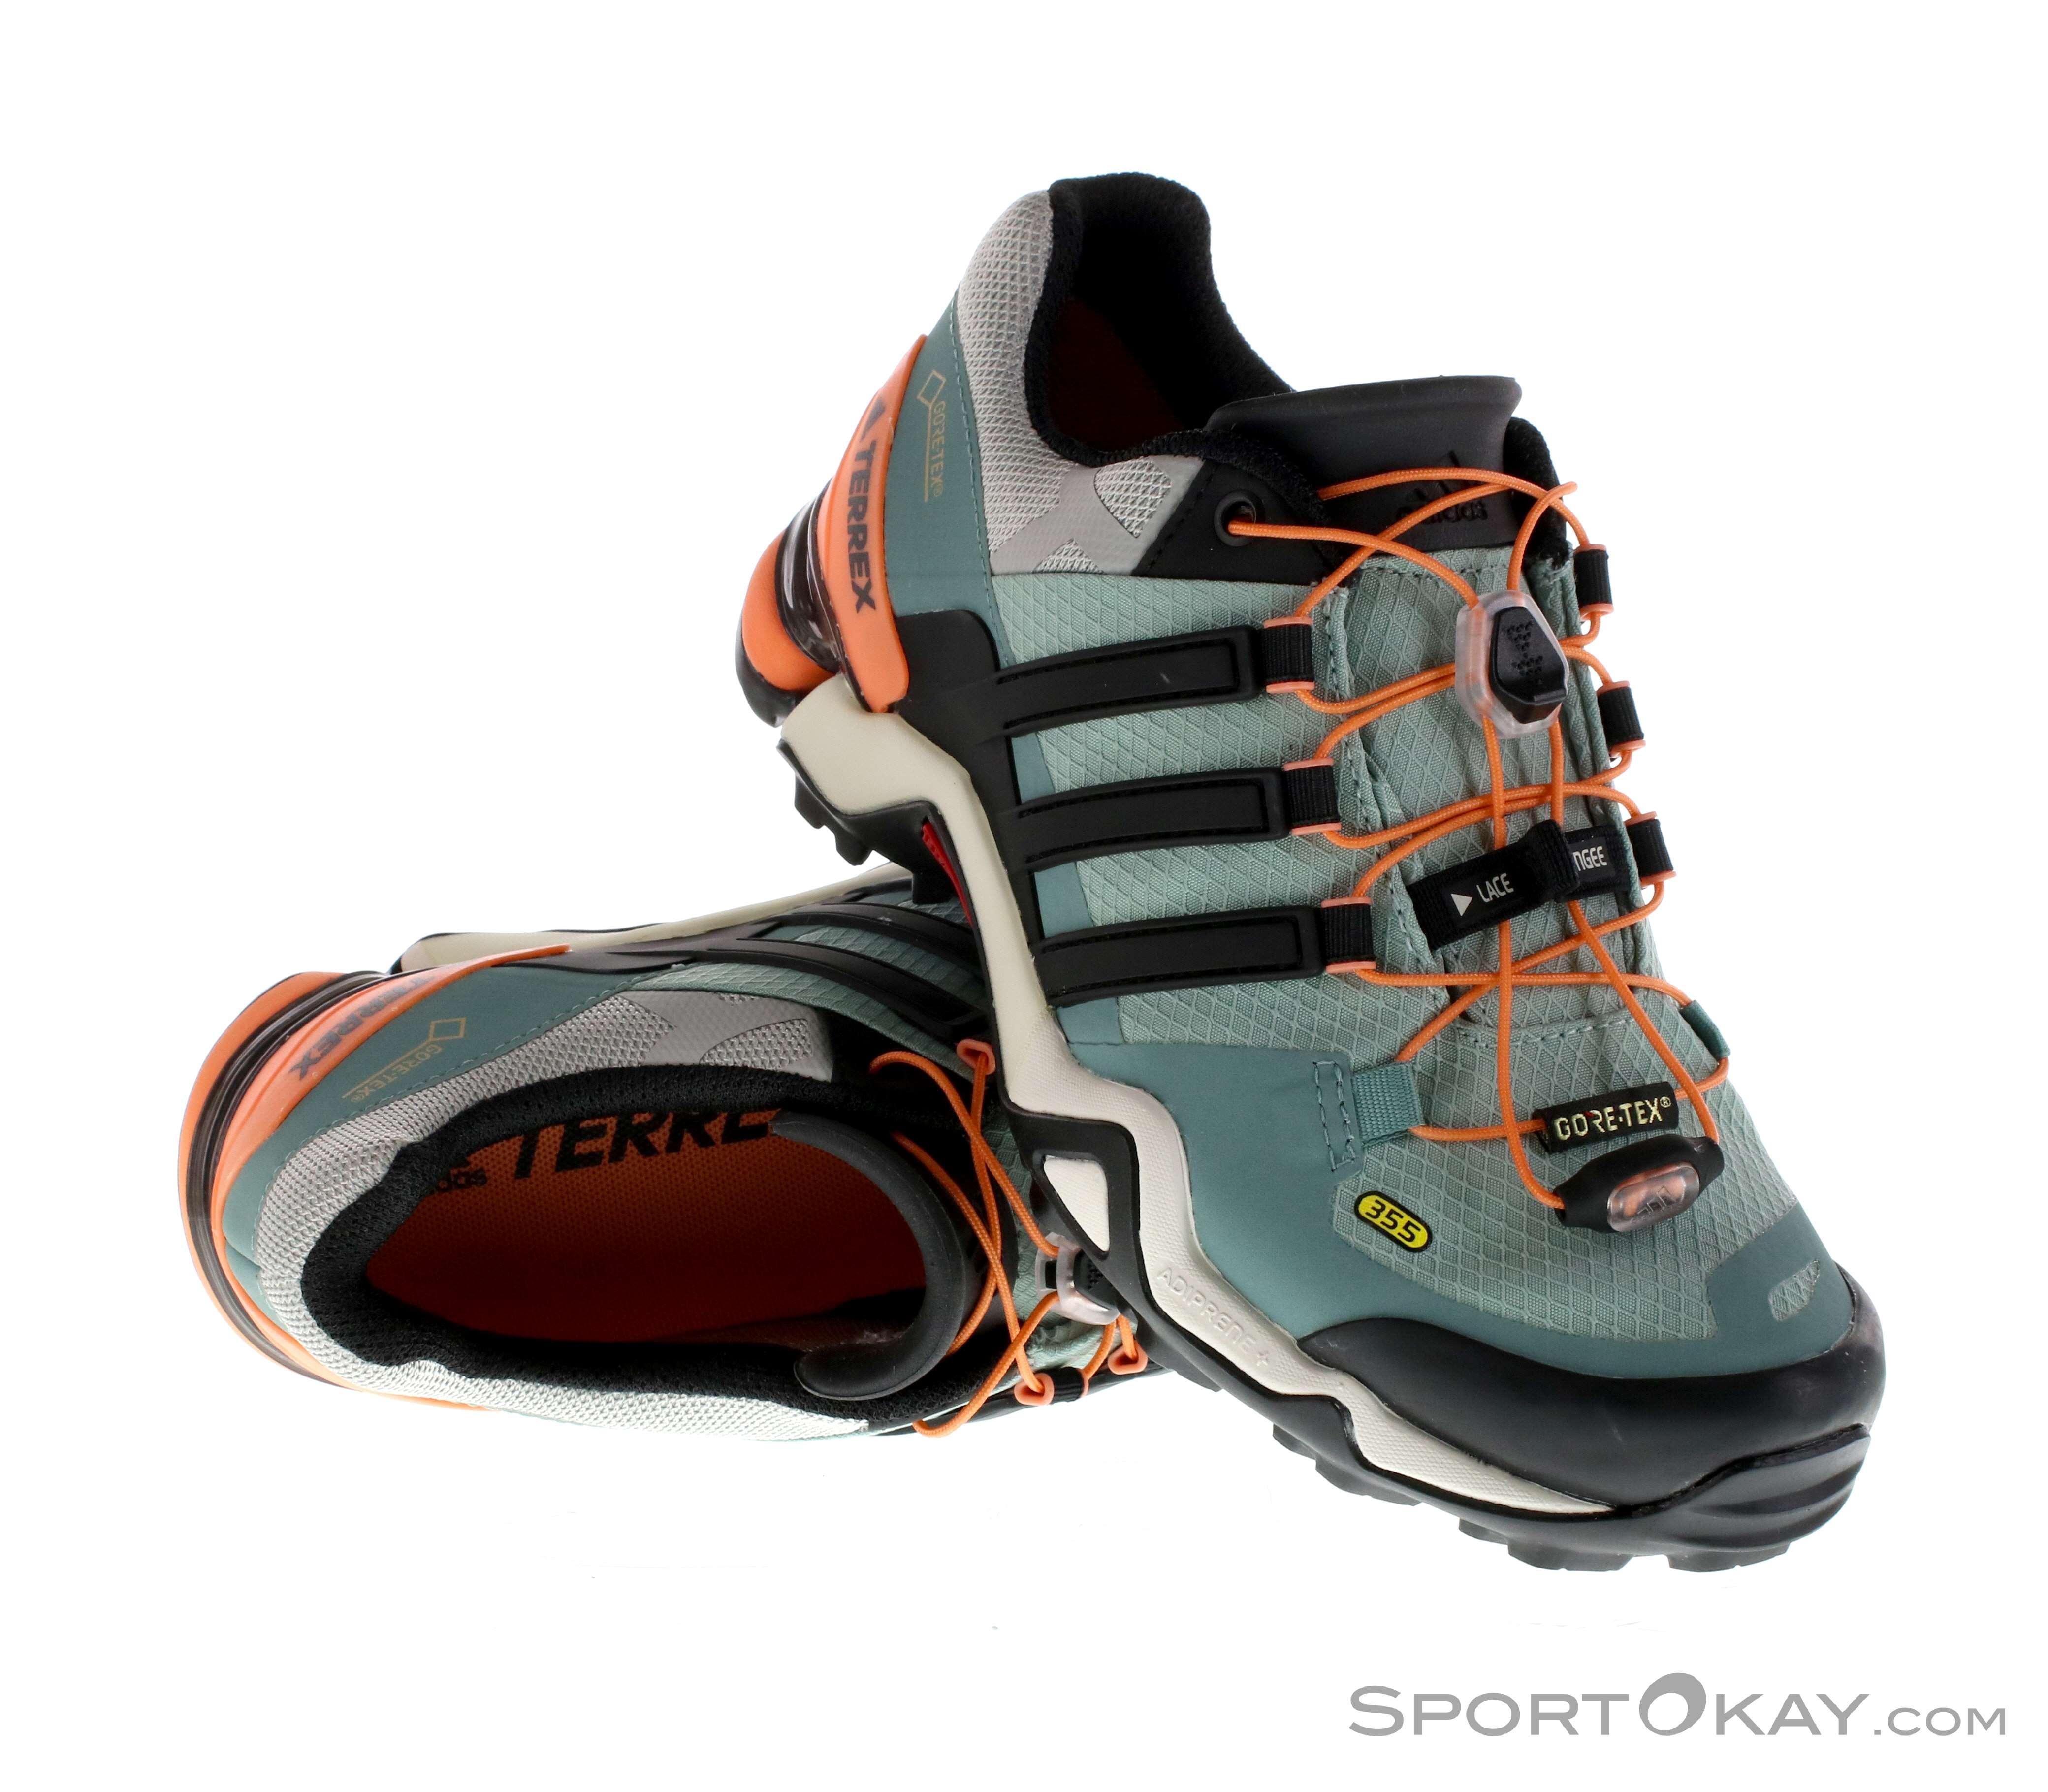 on sale 81650 5059a adidas Terrex Fast R GTX Womens Outdoor Shoes Gore-Tex, adidas, Gray,